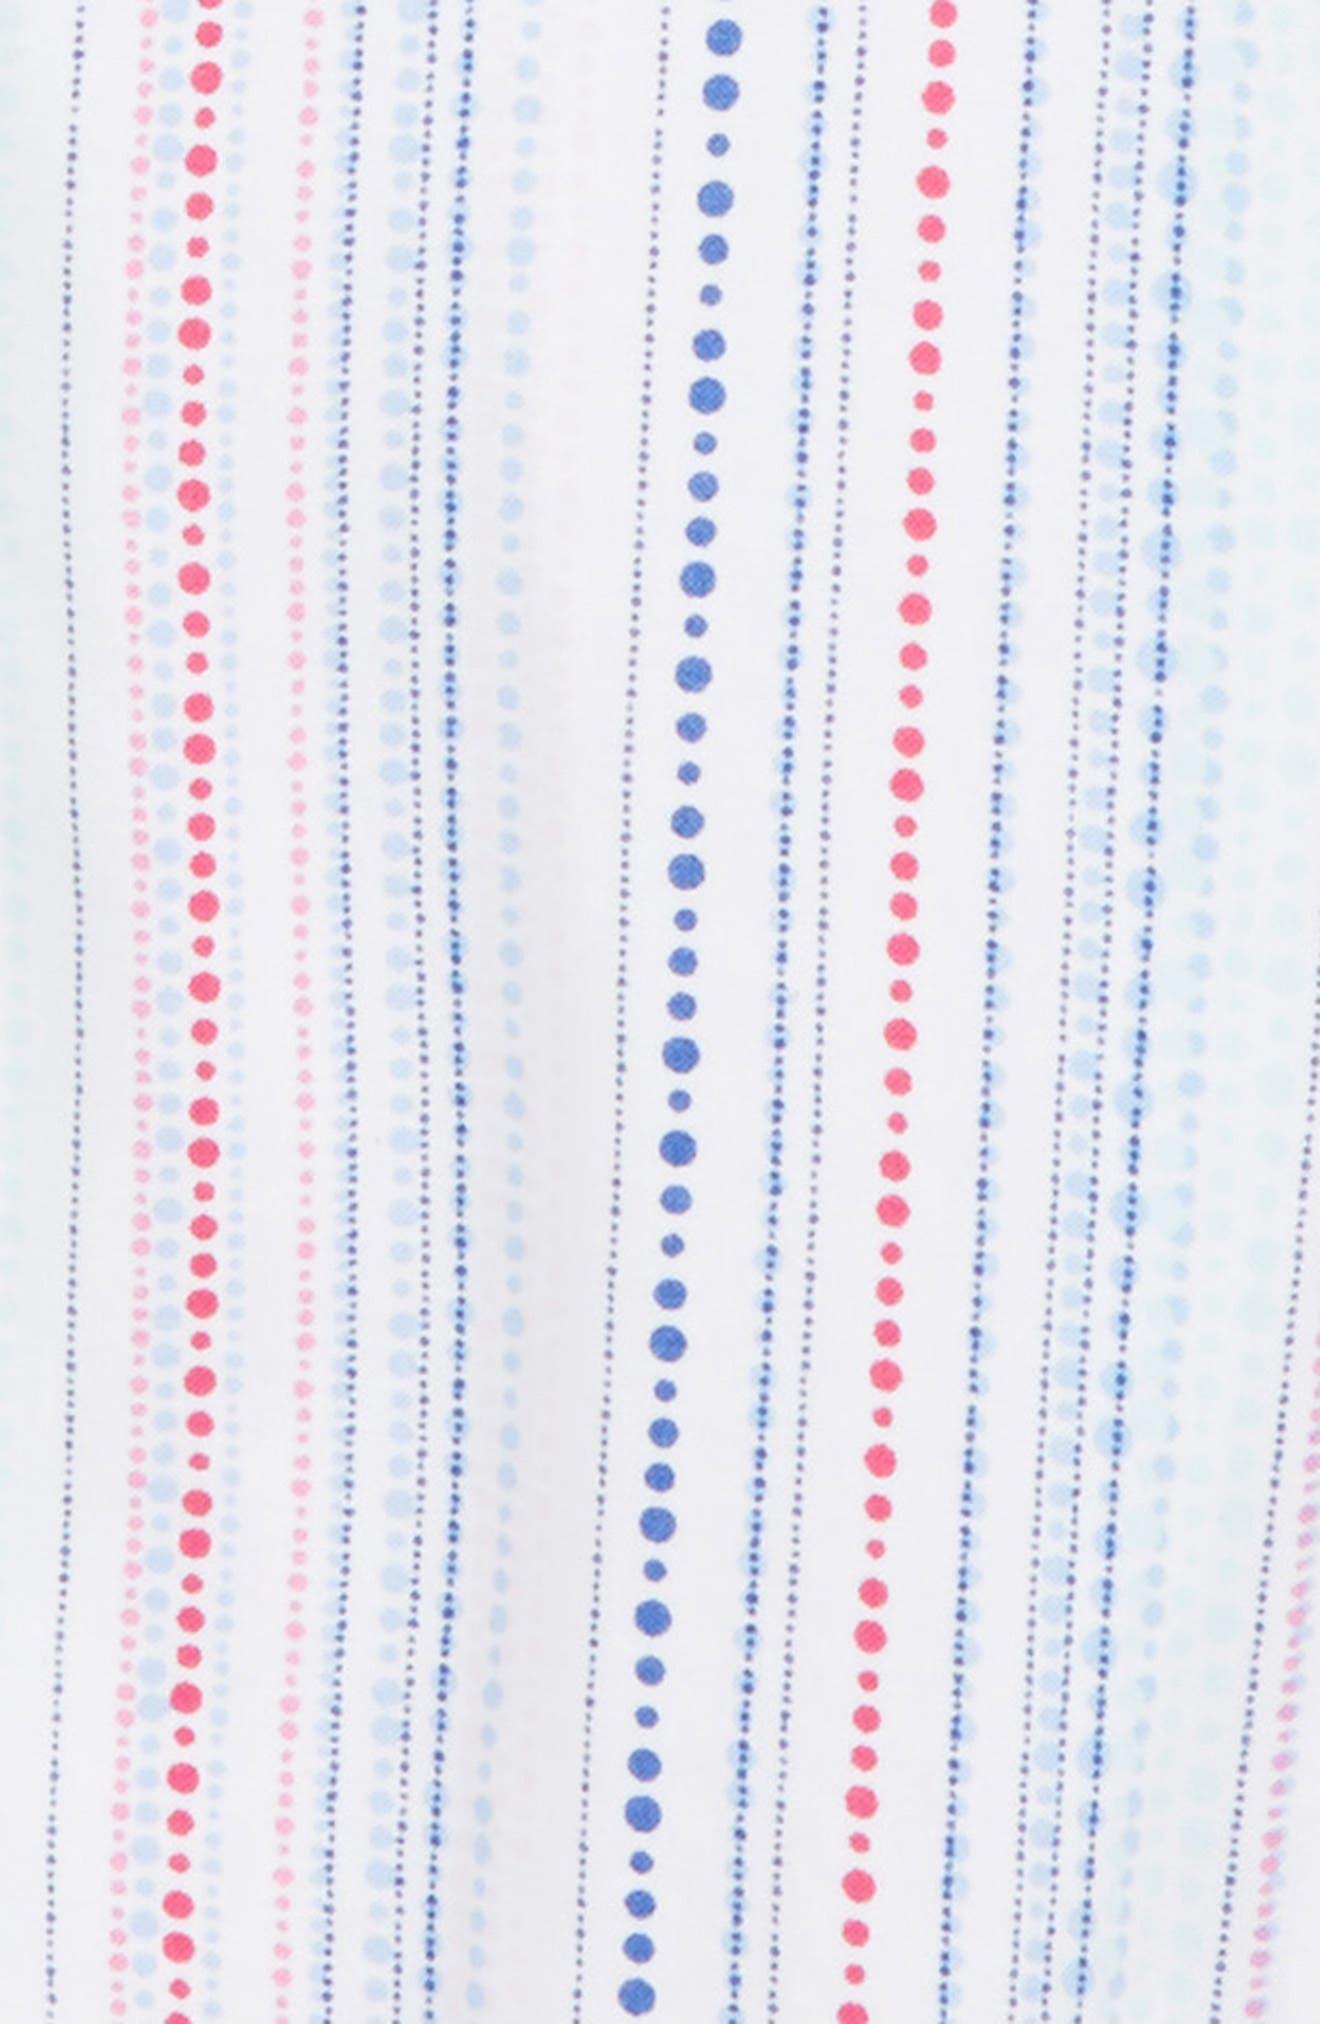 Dot Front Tie Top,                             Alternate thumbnail 2, color,                             White